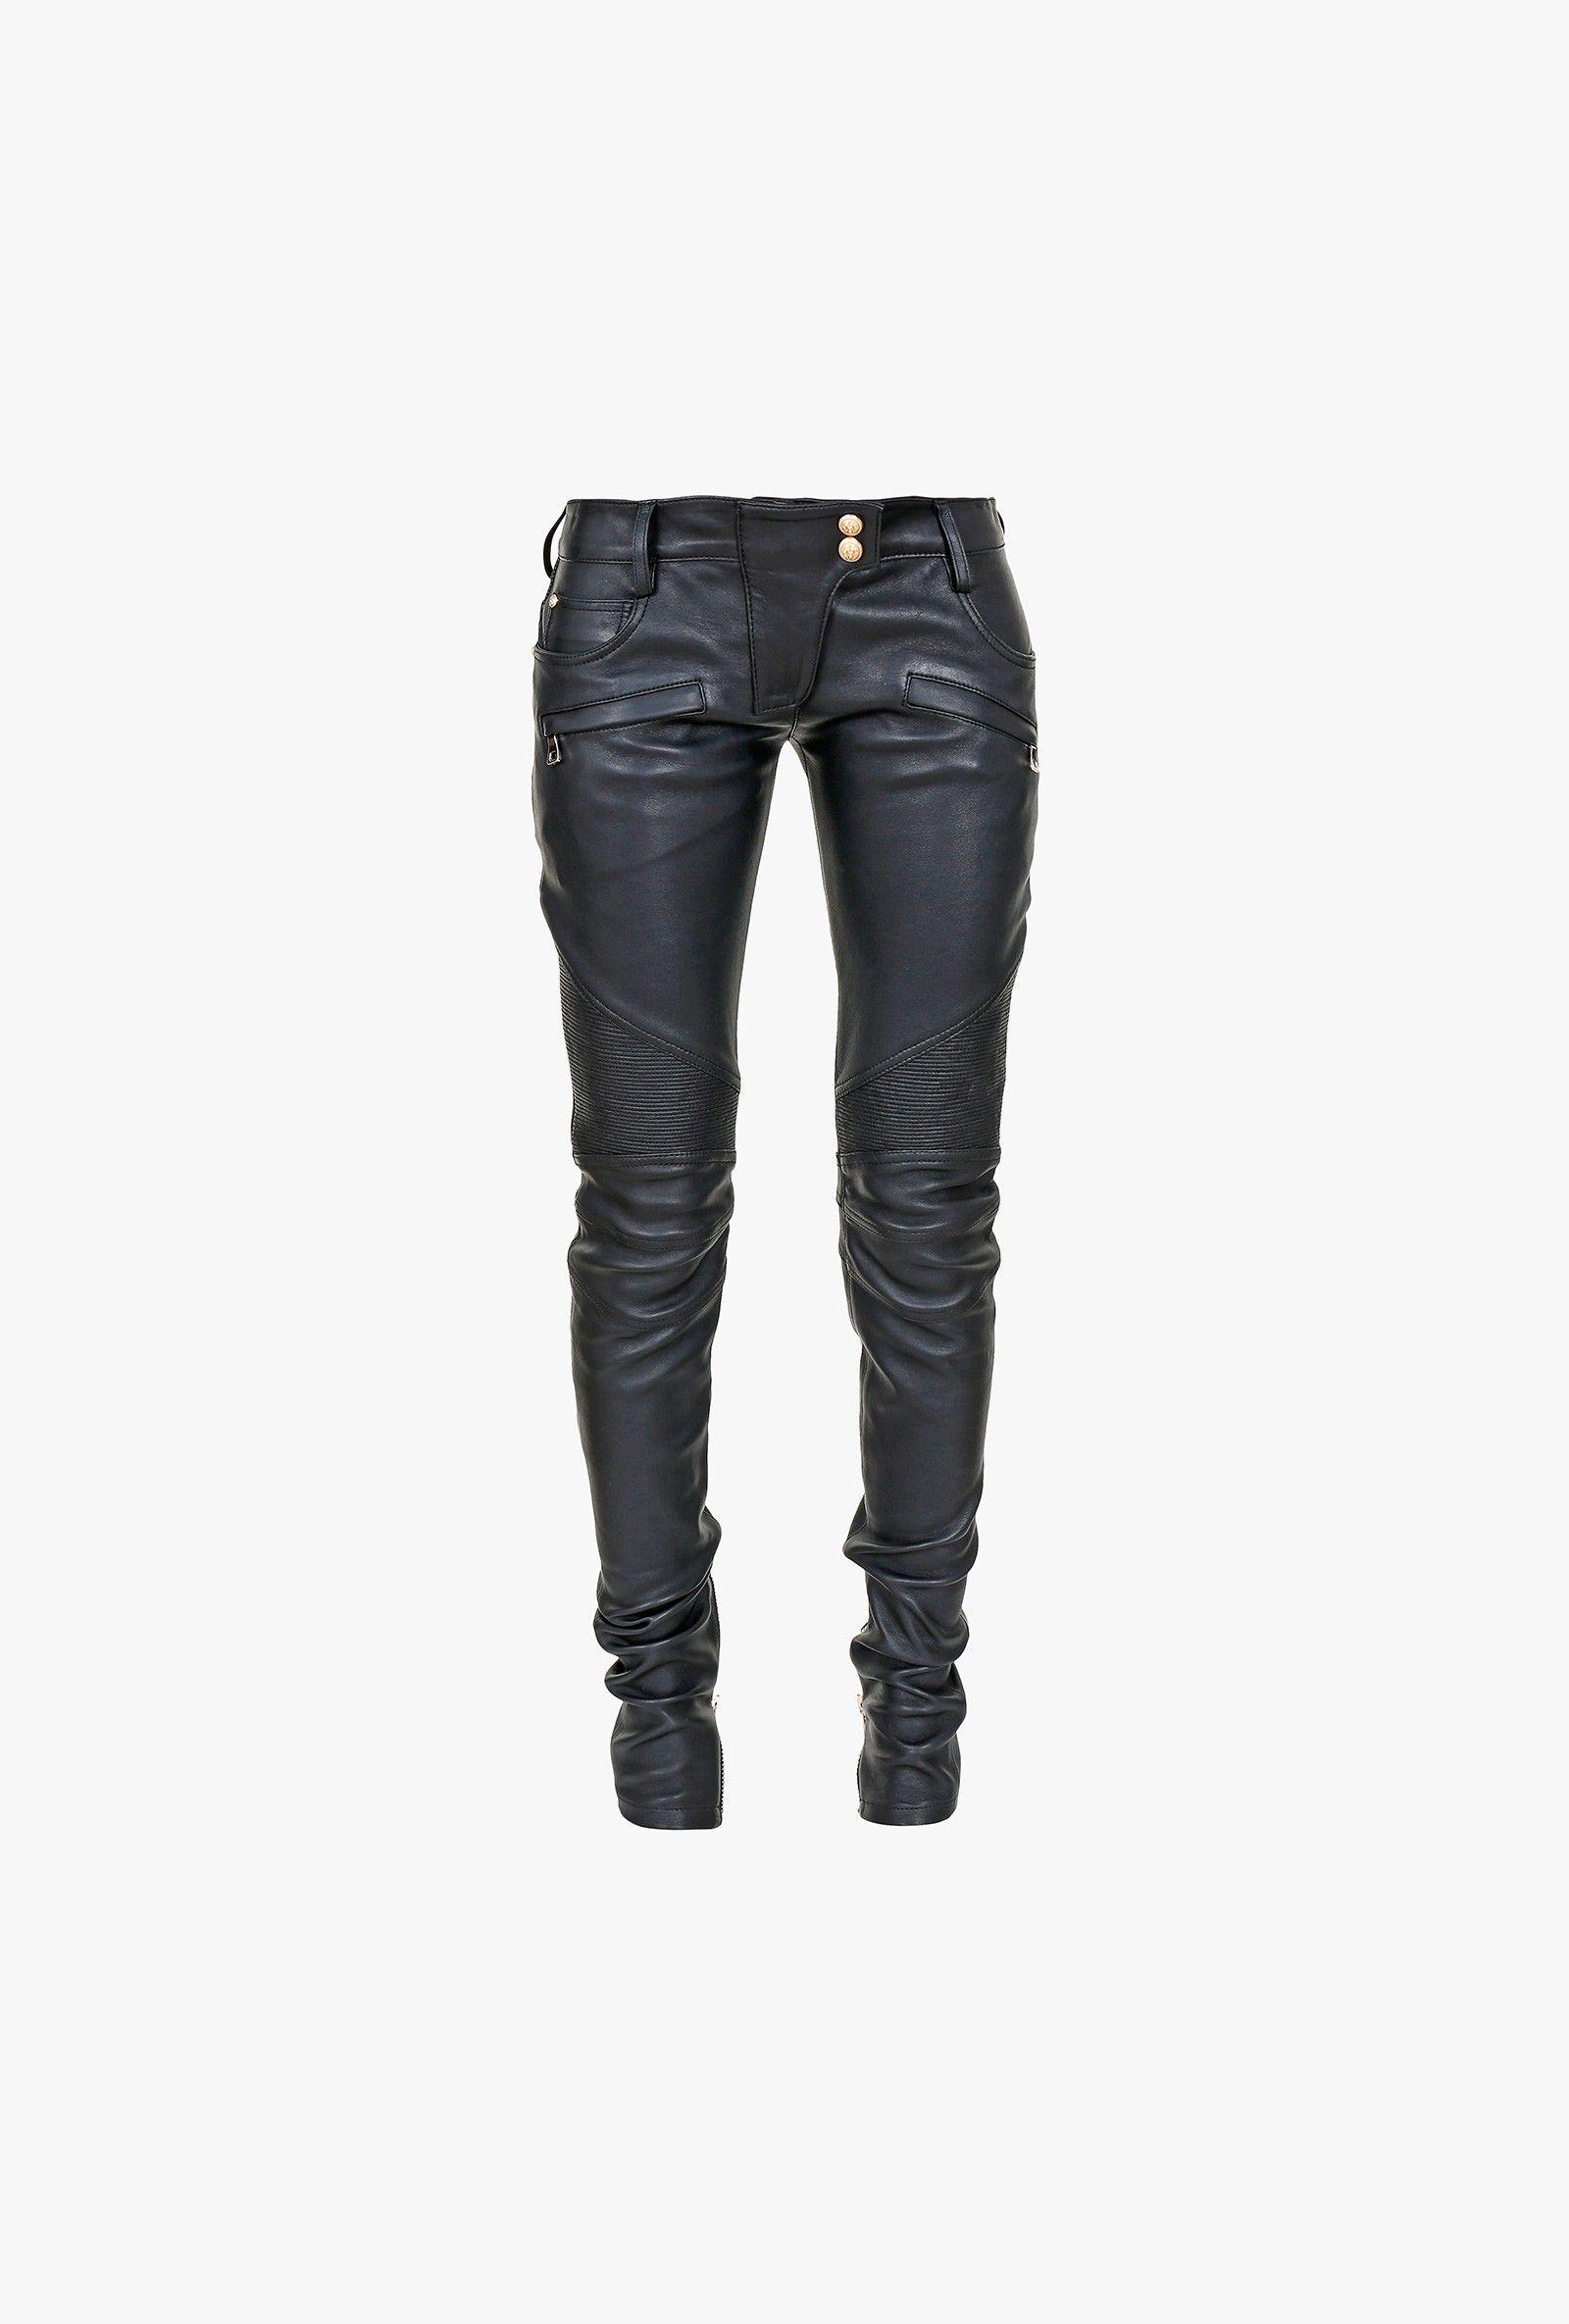 2436973719bbfd Balmain - Stretch leather biker pants - Women's leather trousers ...